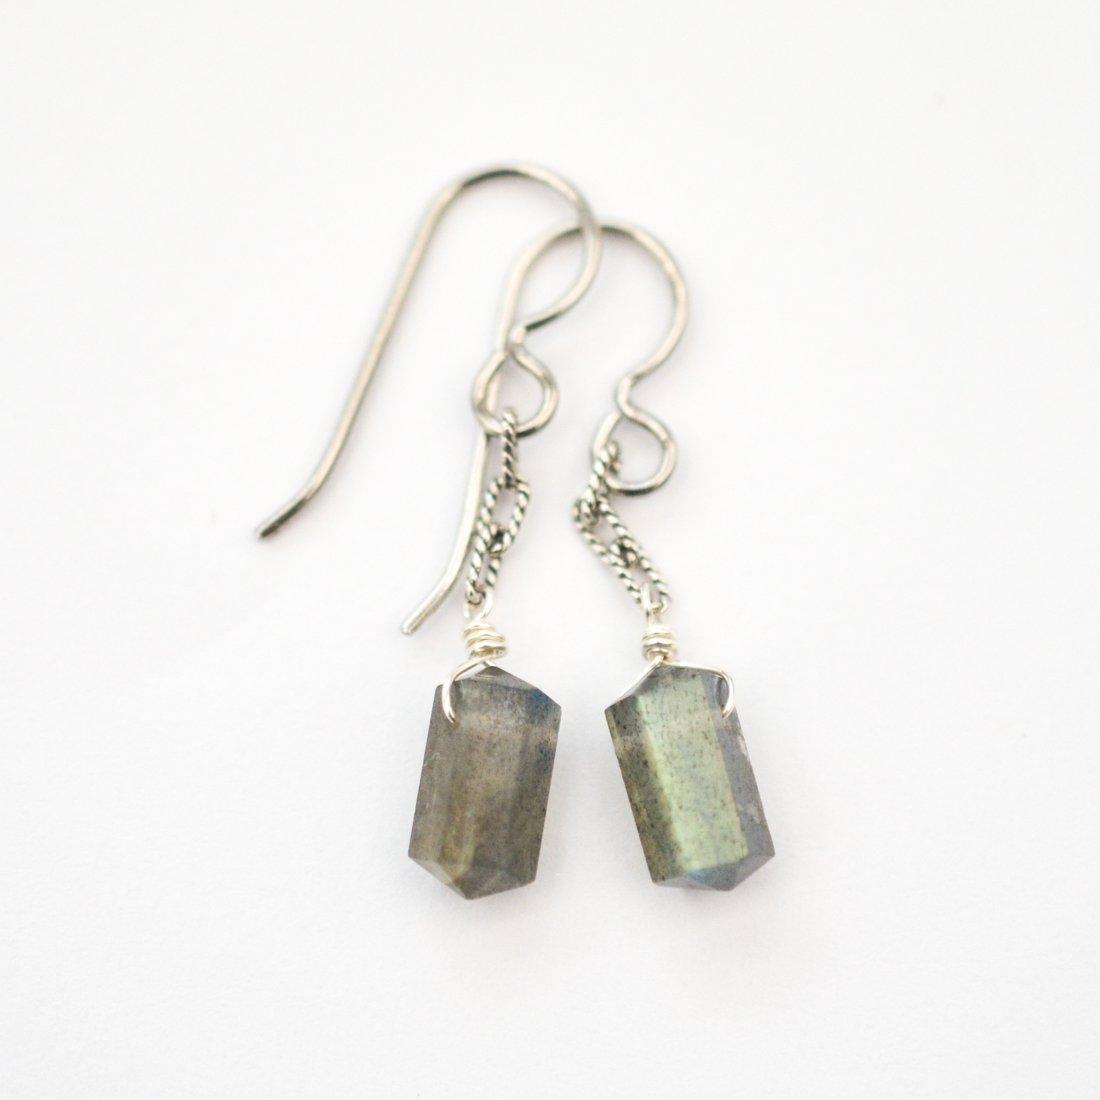 Image of Labradorite Spike Earrings